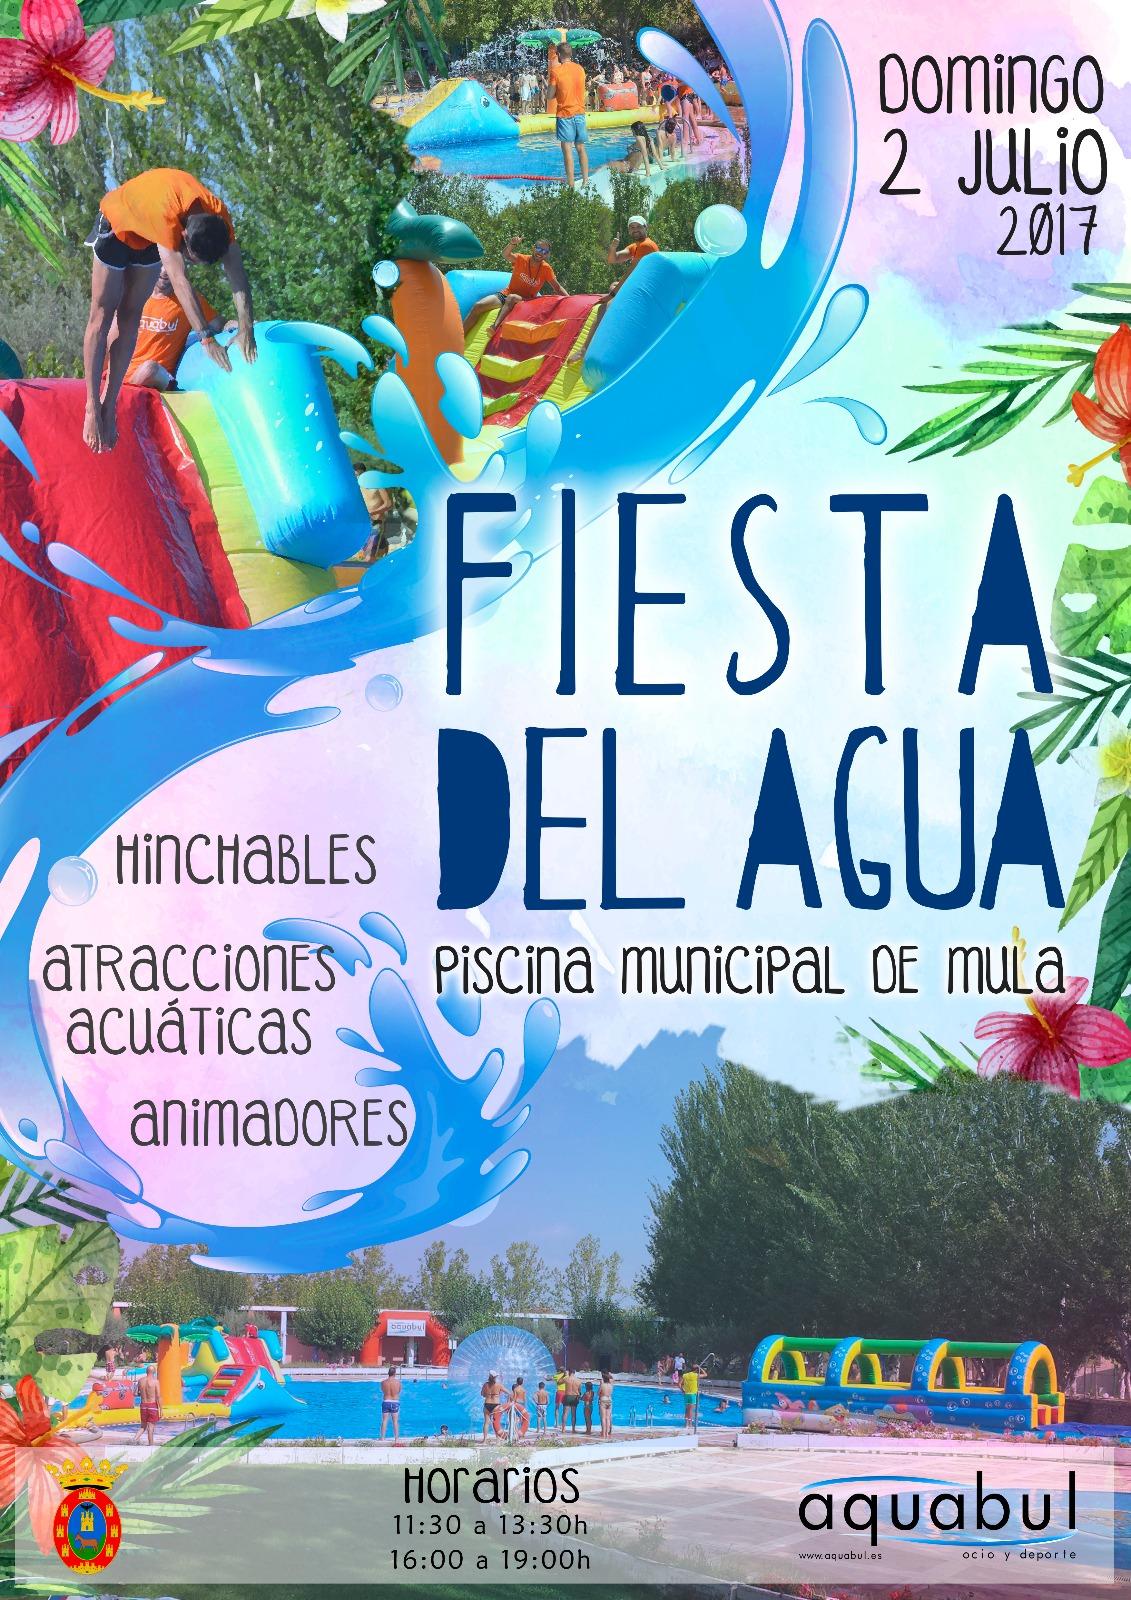 Fiesta del agua en la piscina municipal 2 de julio - Fiesta de piscina ...